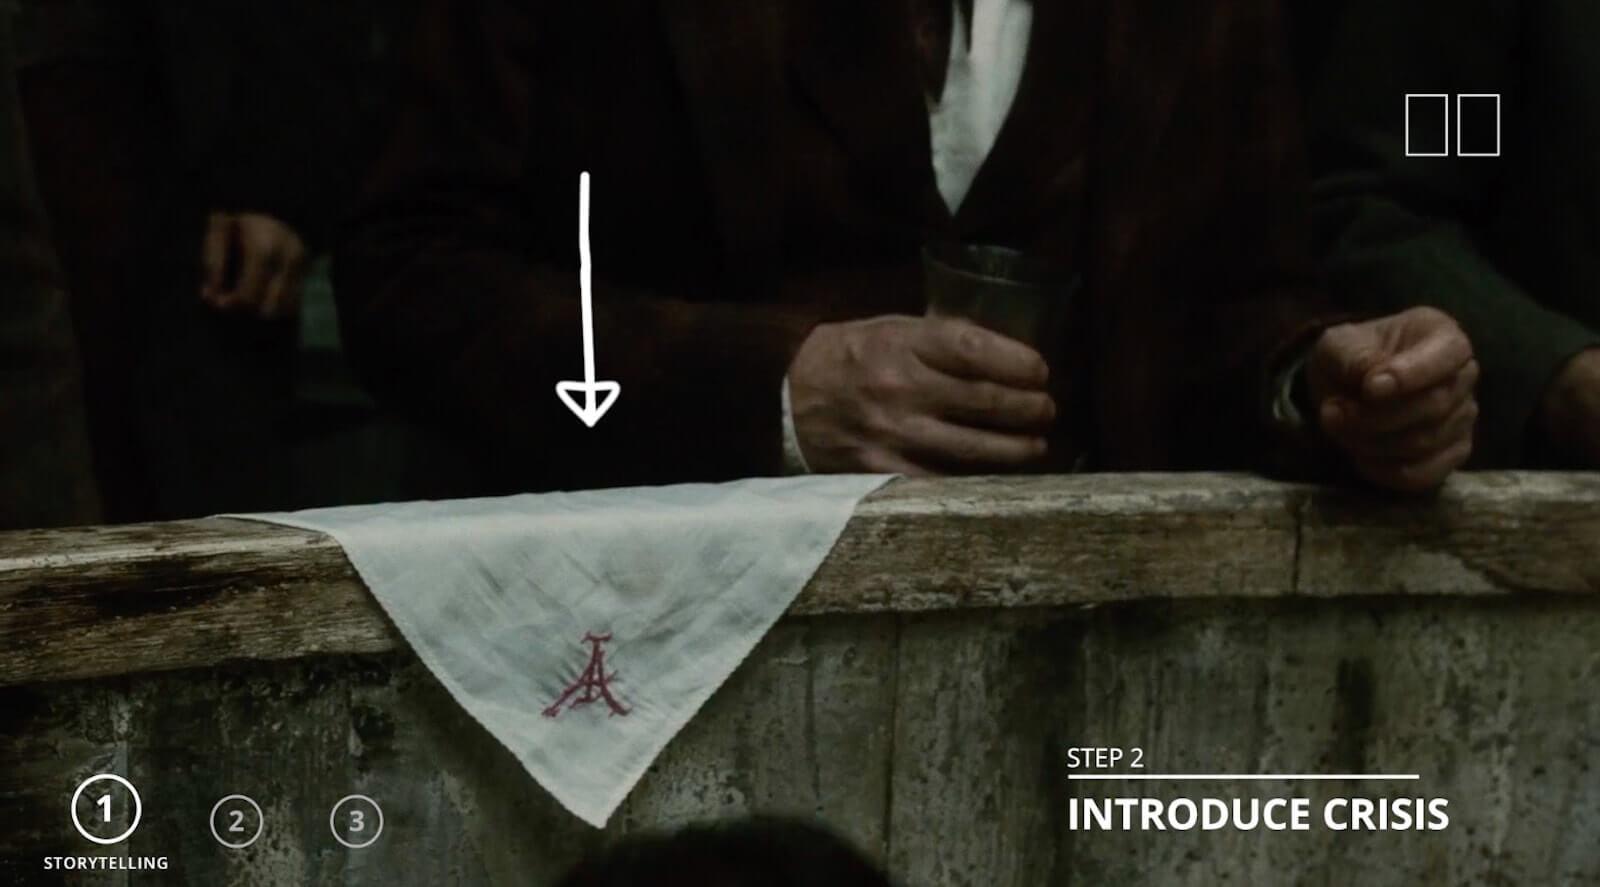 Sherlock Holmes fight scene - Introduce Crisis - Adlers Handkercheif